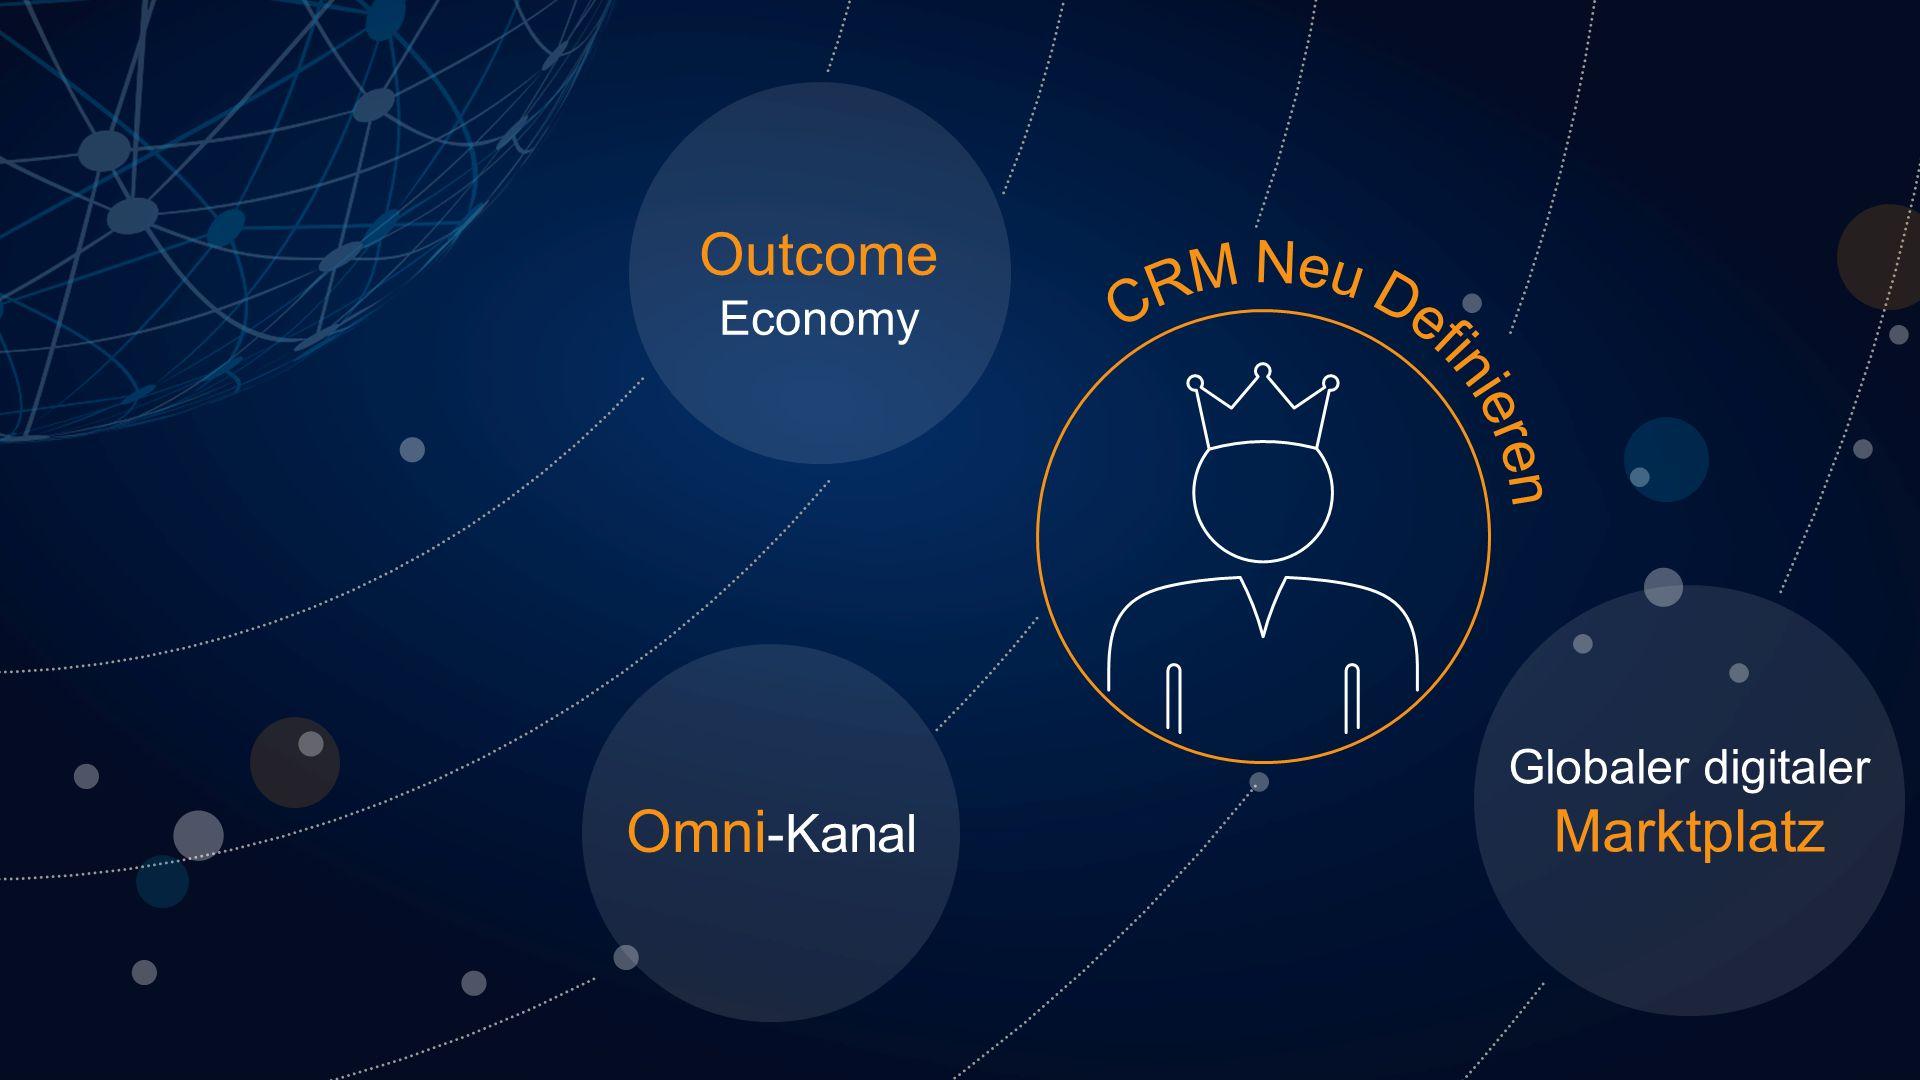 Globaler digitaler Marktplatz Outcome Economy Omni -Kanal